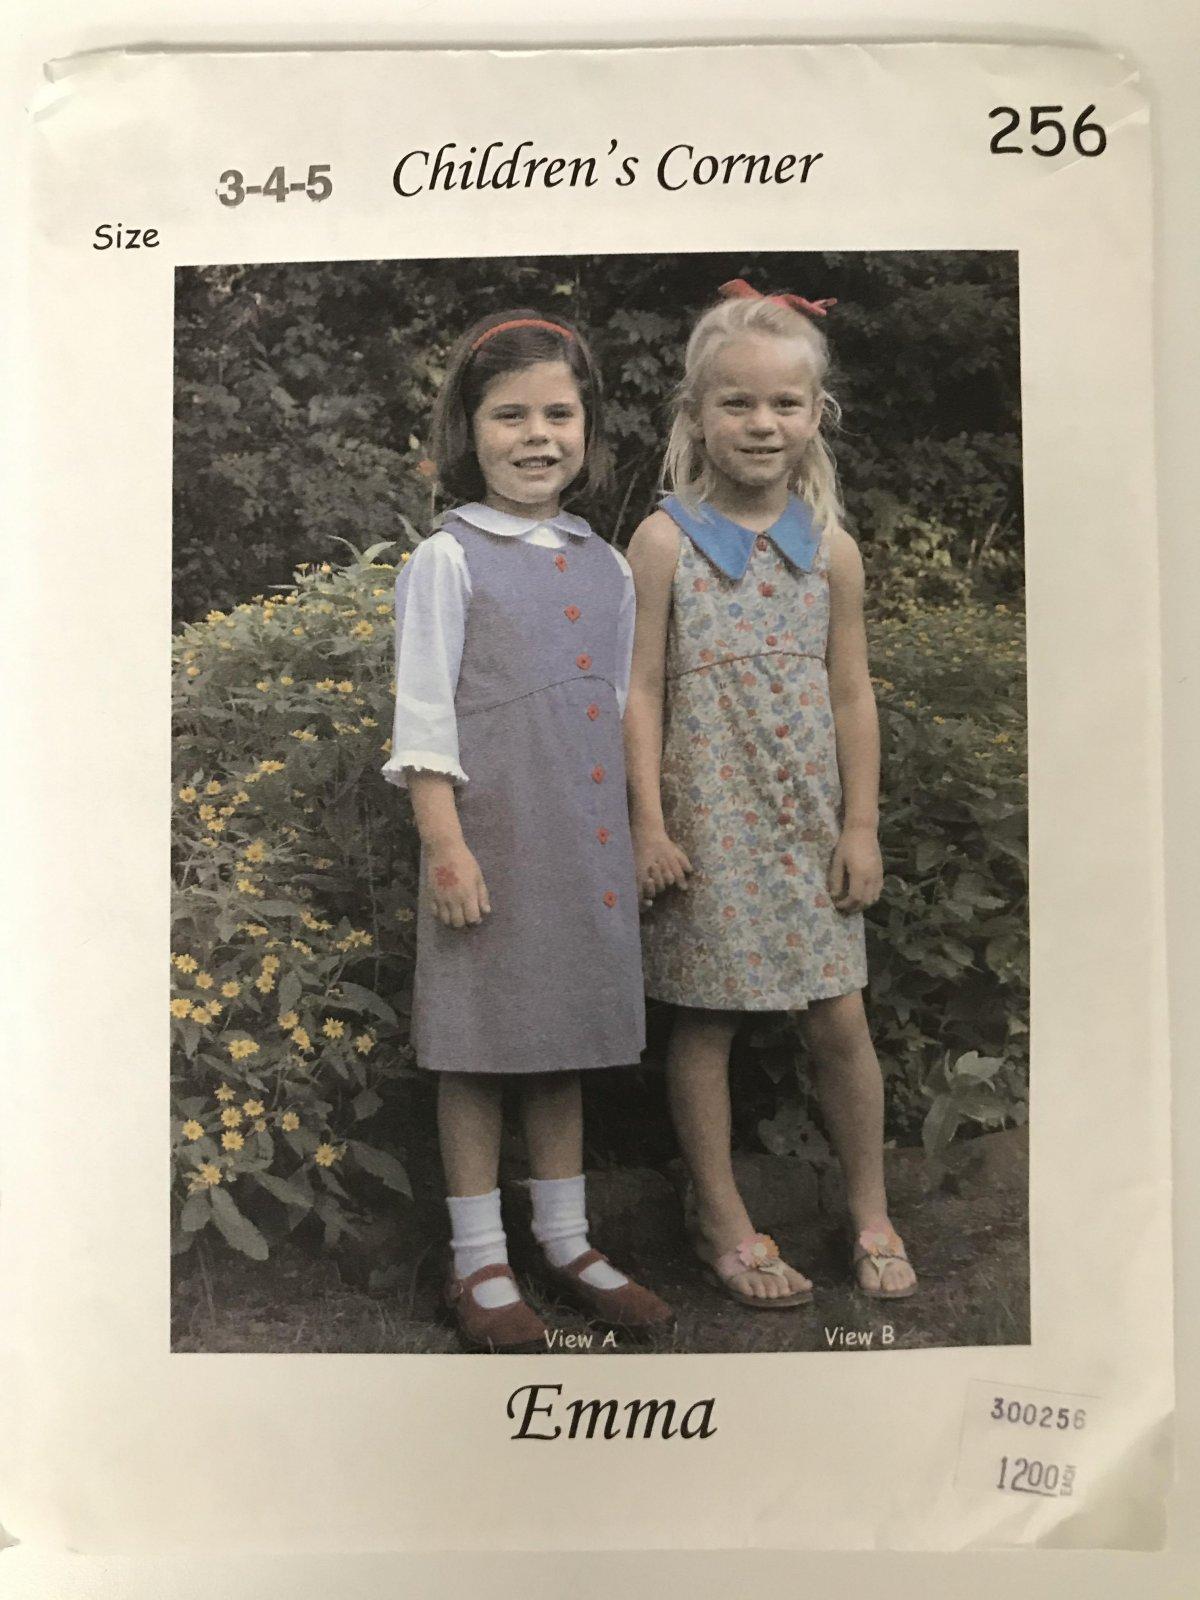 CHILDREN'S CORNER EMMA